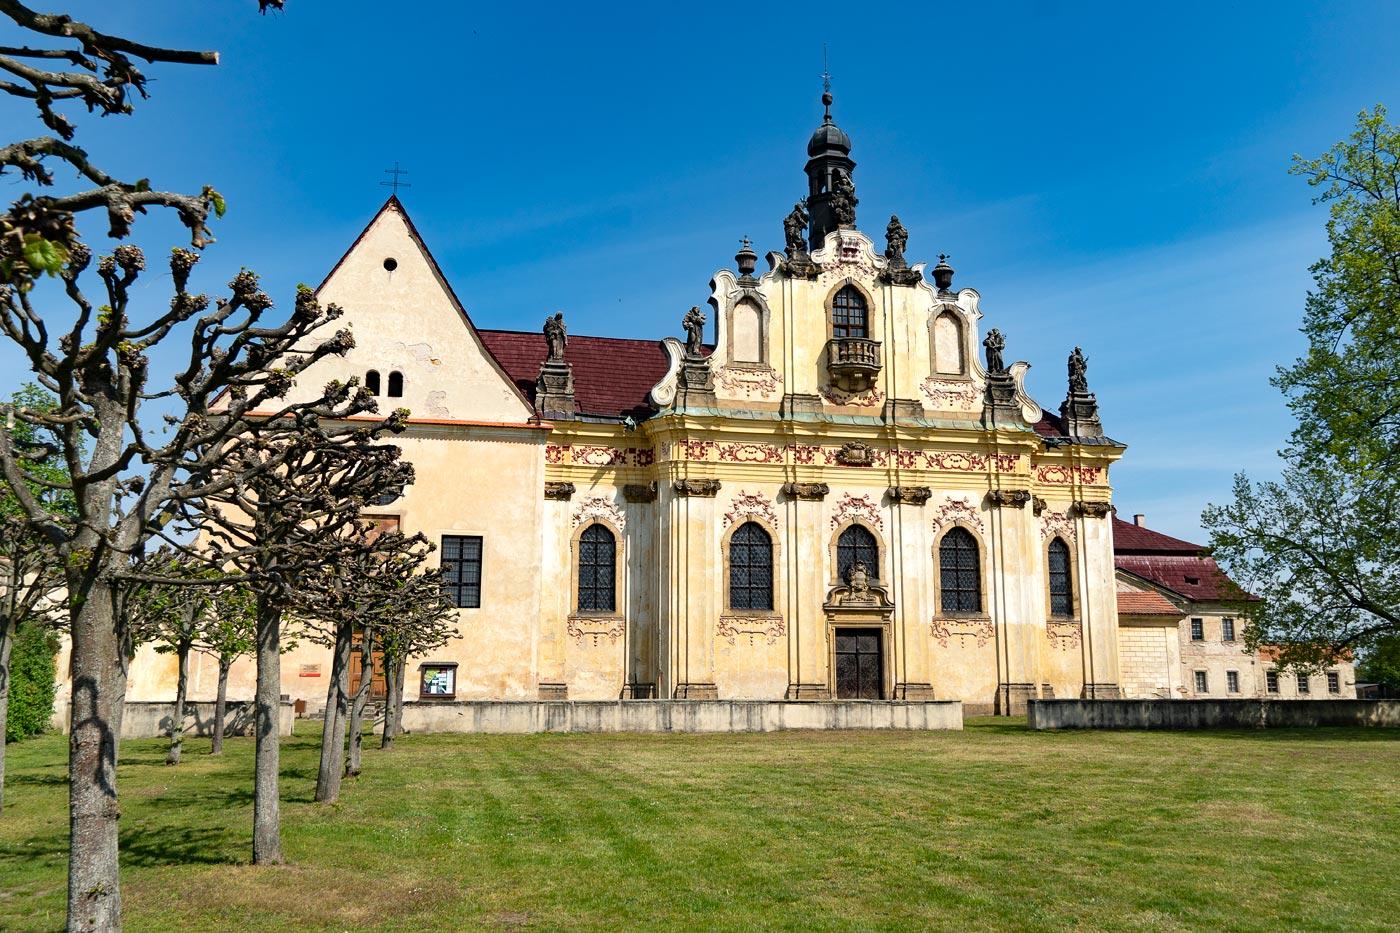 Дворец в Мнихово Градиште